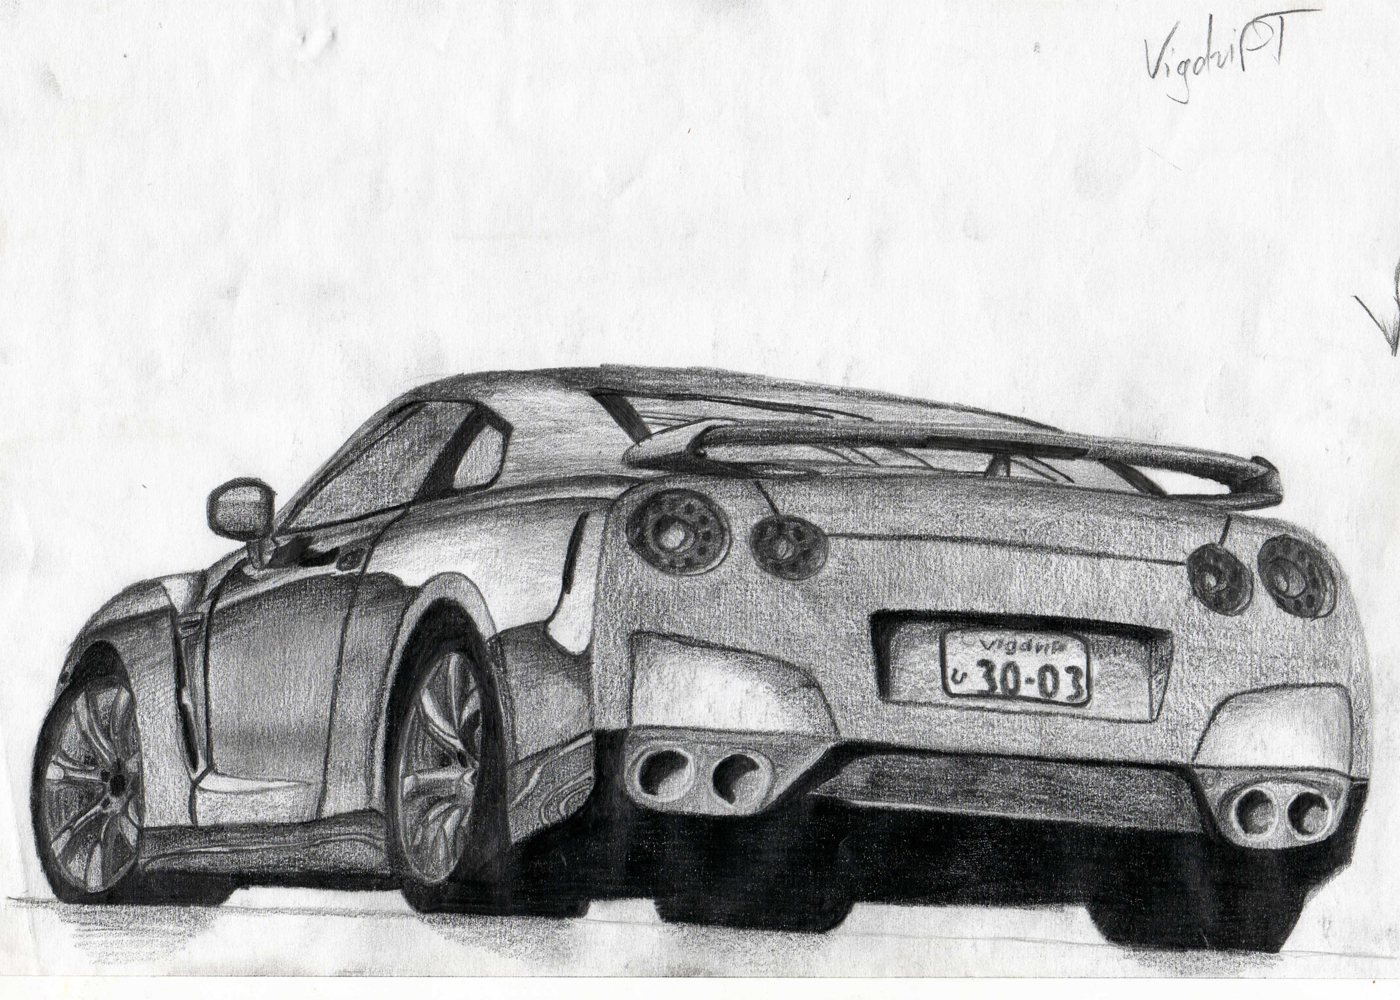 Nissan GT-R drawing by VigdriFT on DeviantArt